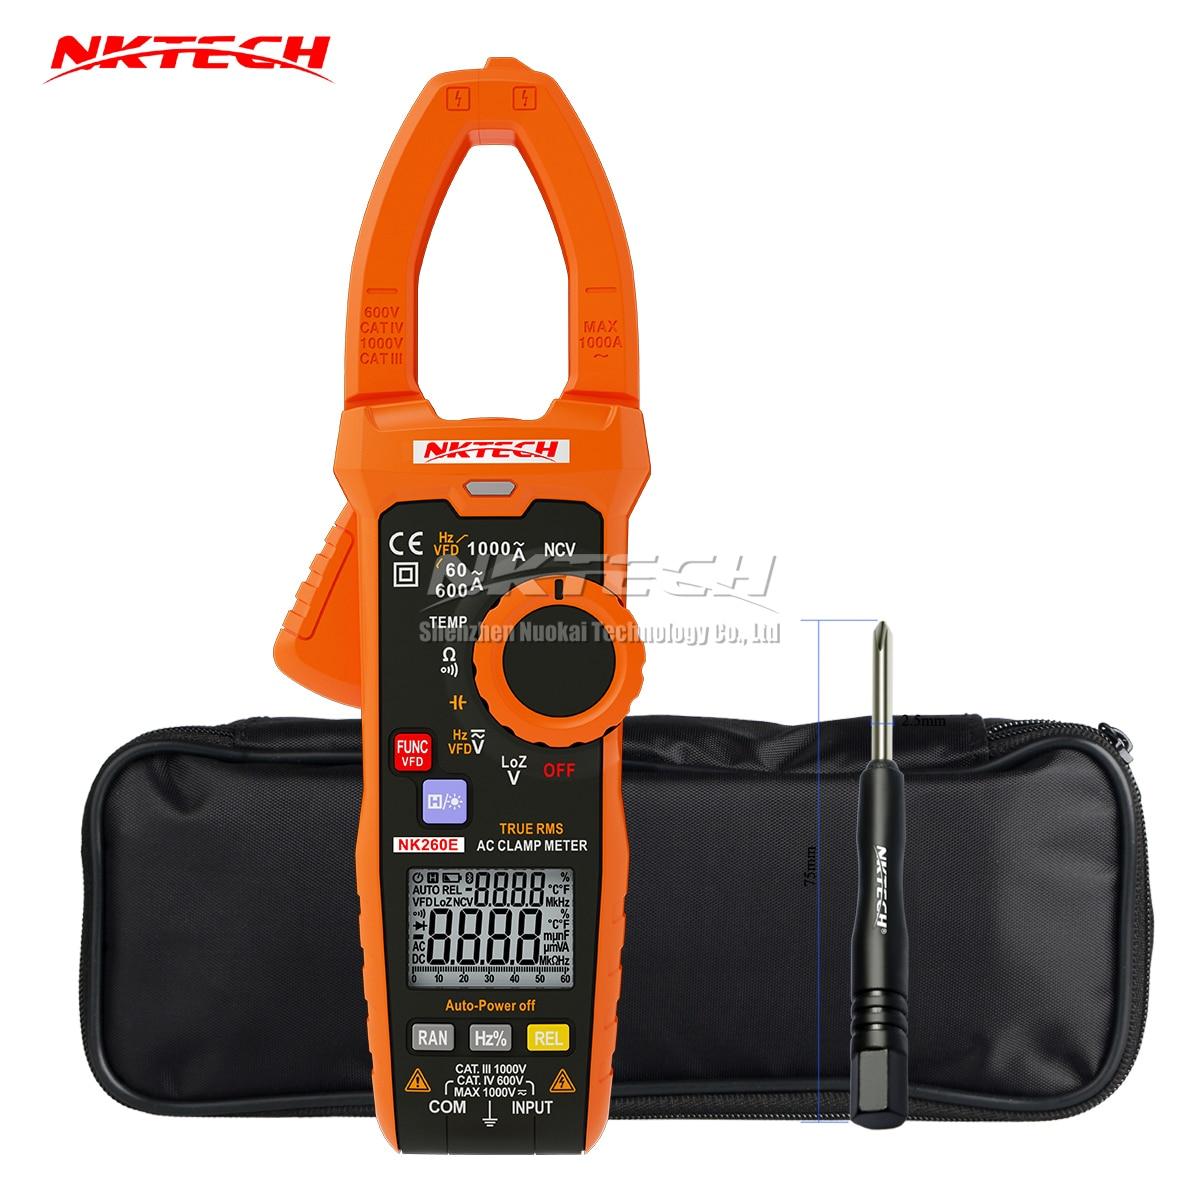 NKTECH NK260E Digital Clamp Meter 1000 V VFD Temperatura Analogico Bar Graph Ture RMS AC DC V ACA Resistenza Frequenza capacità